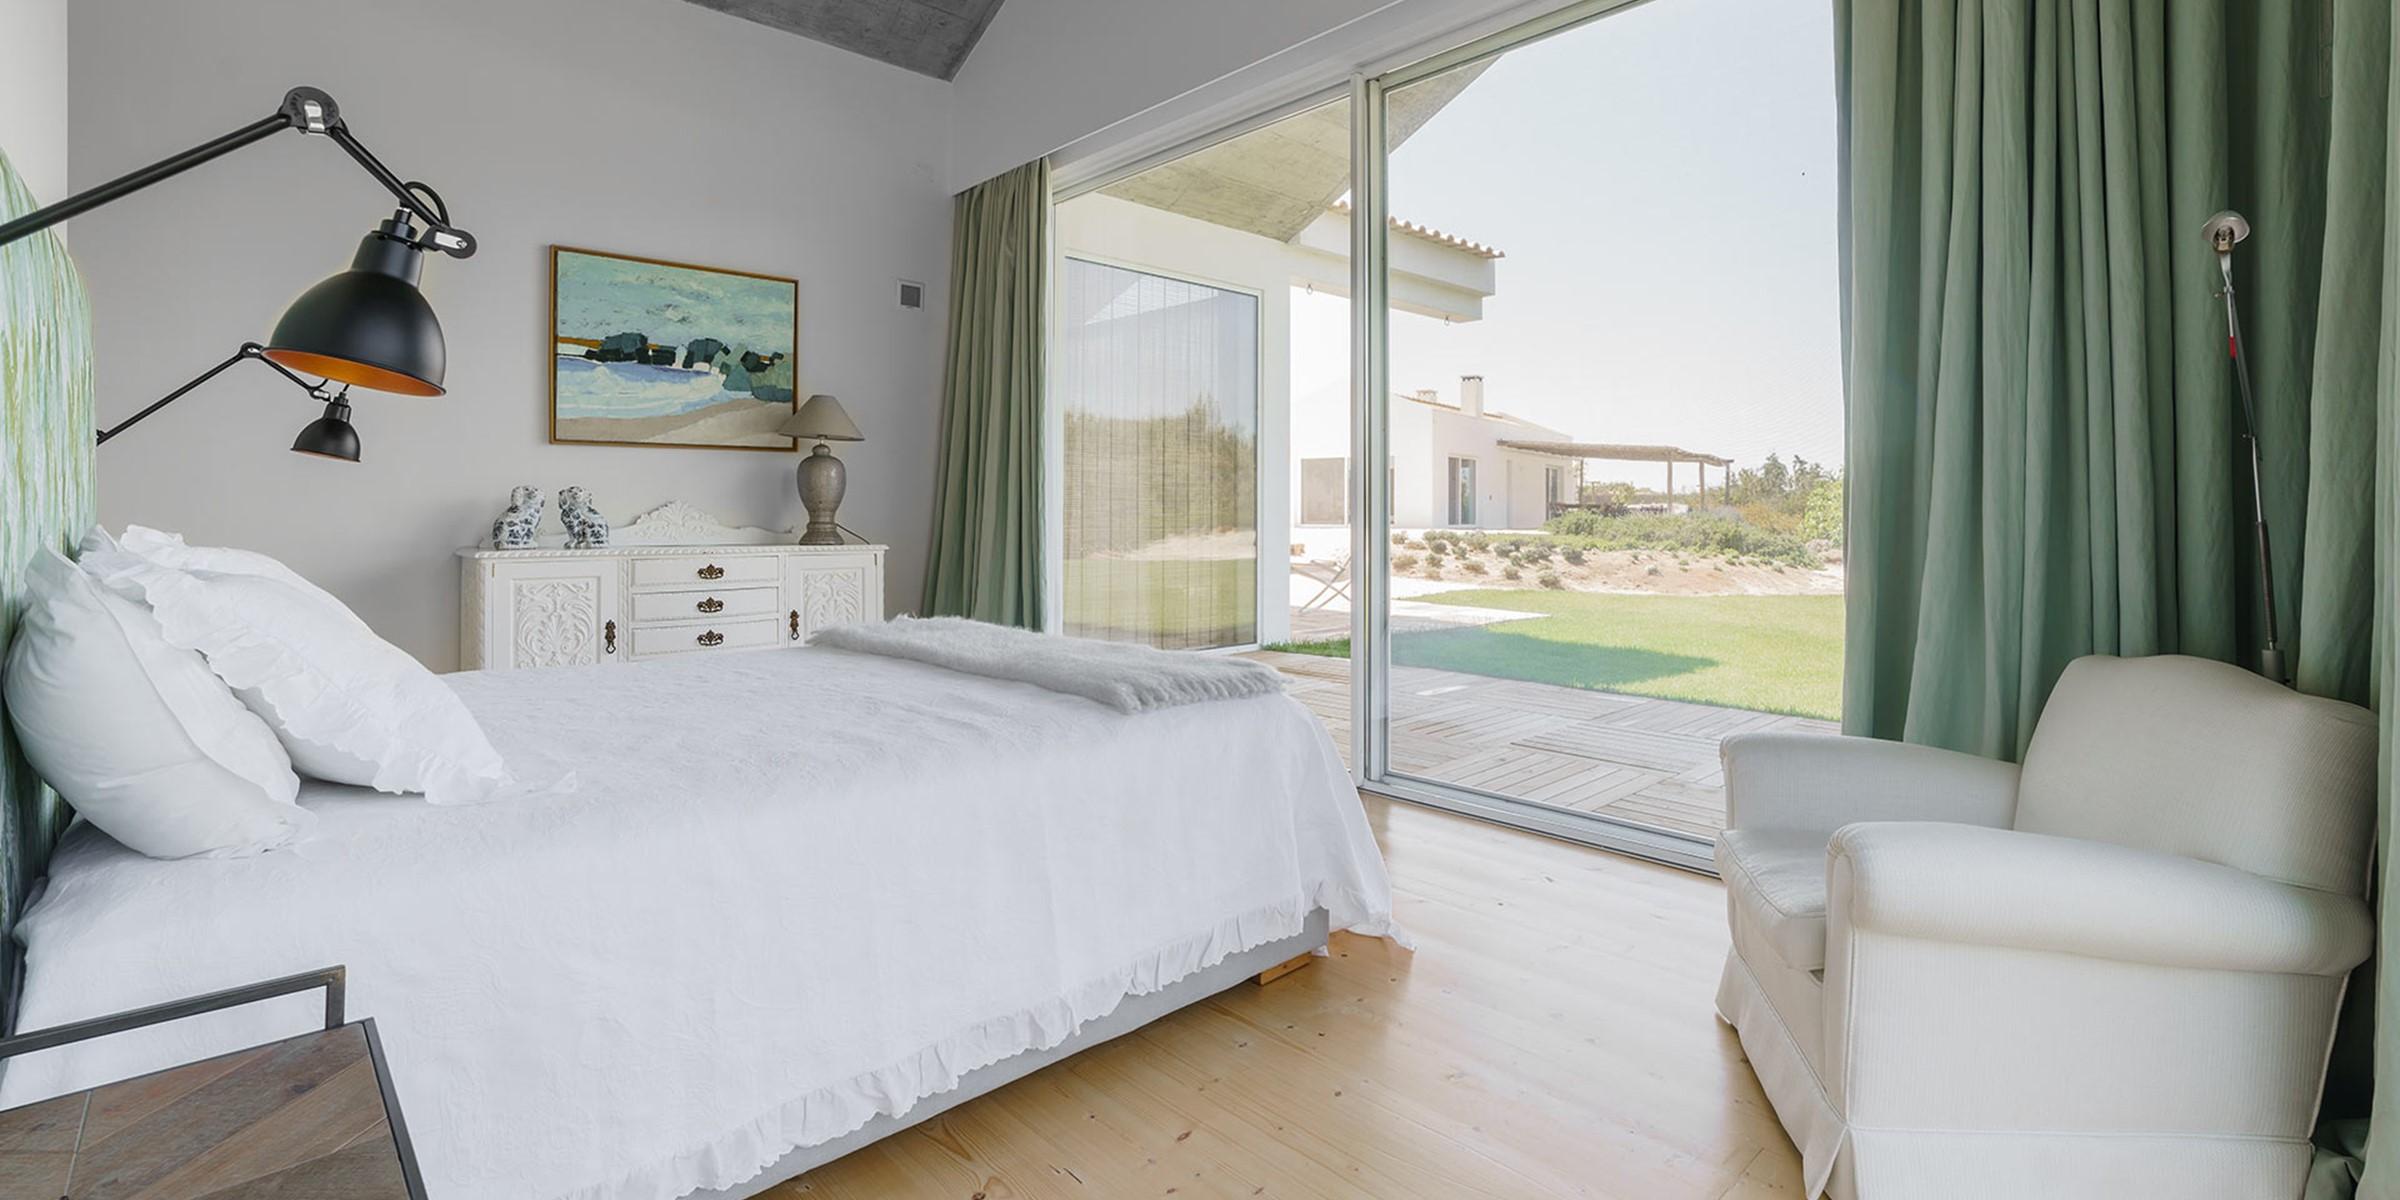 5Master Bedroom